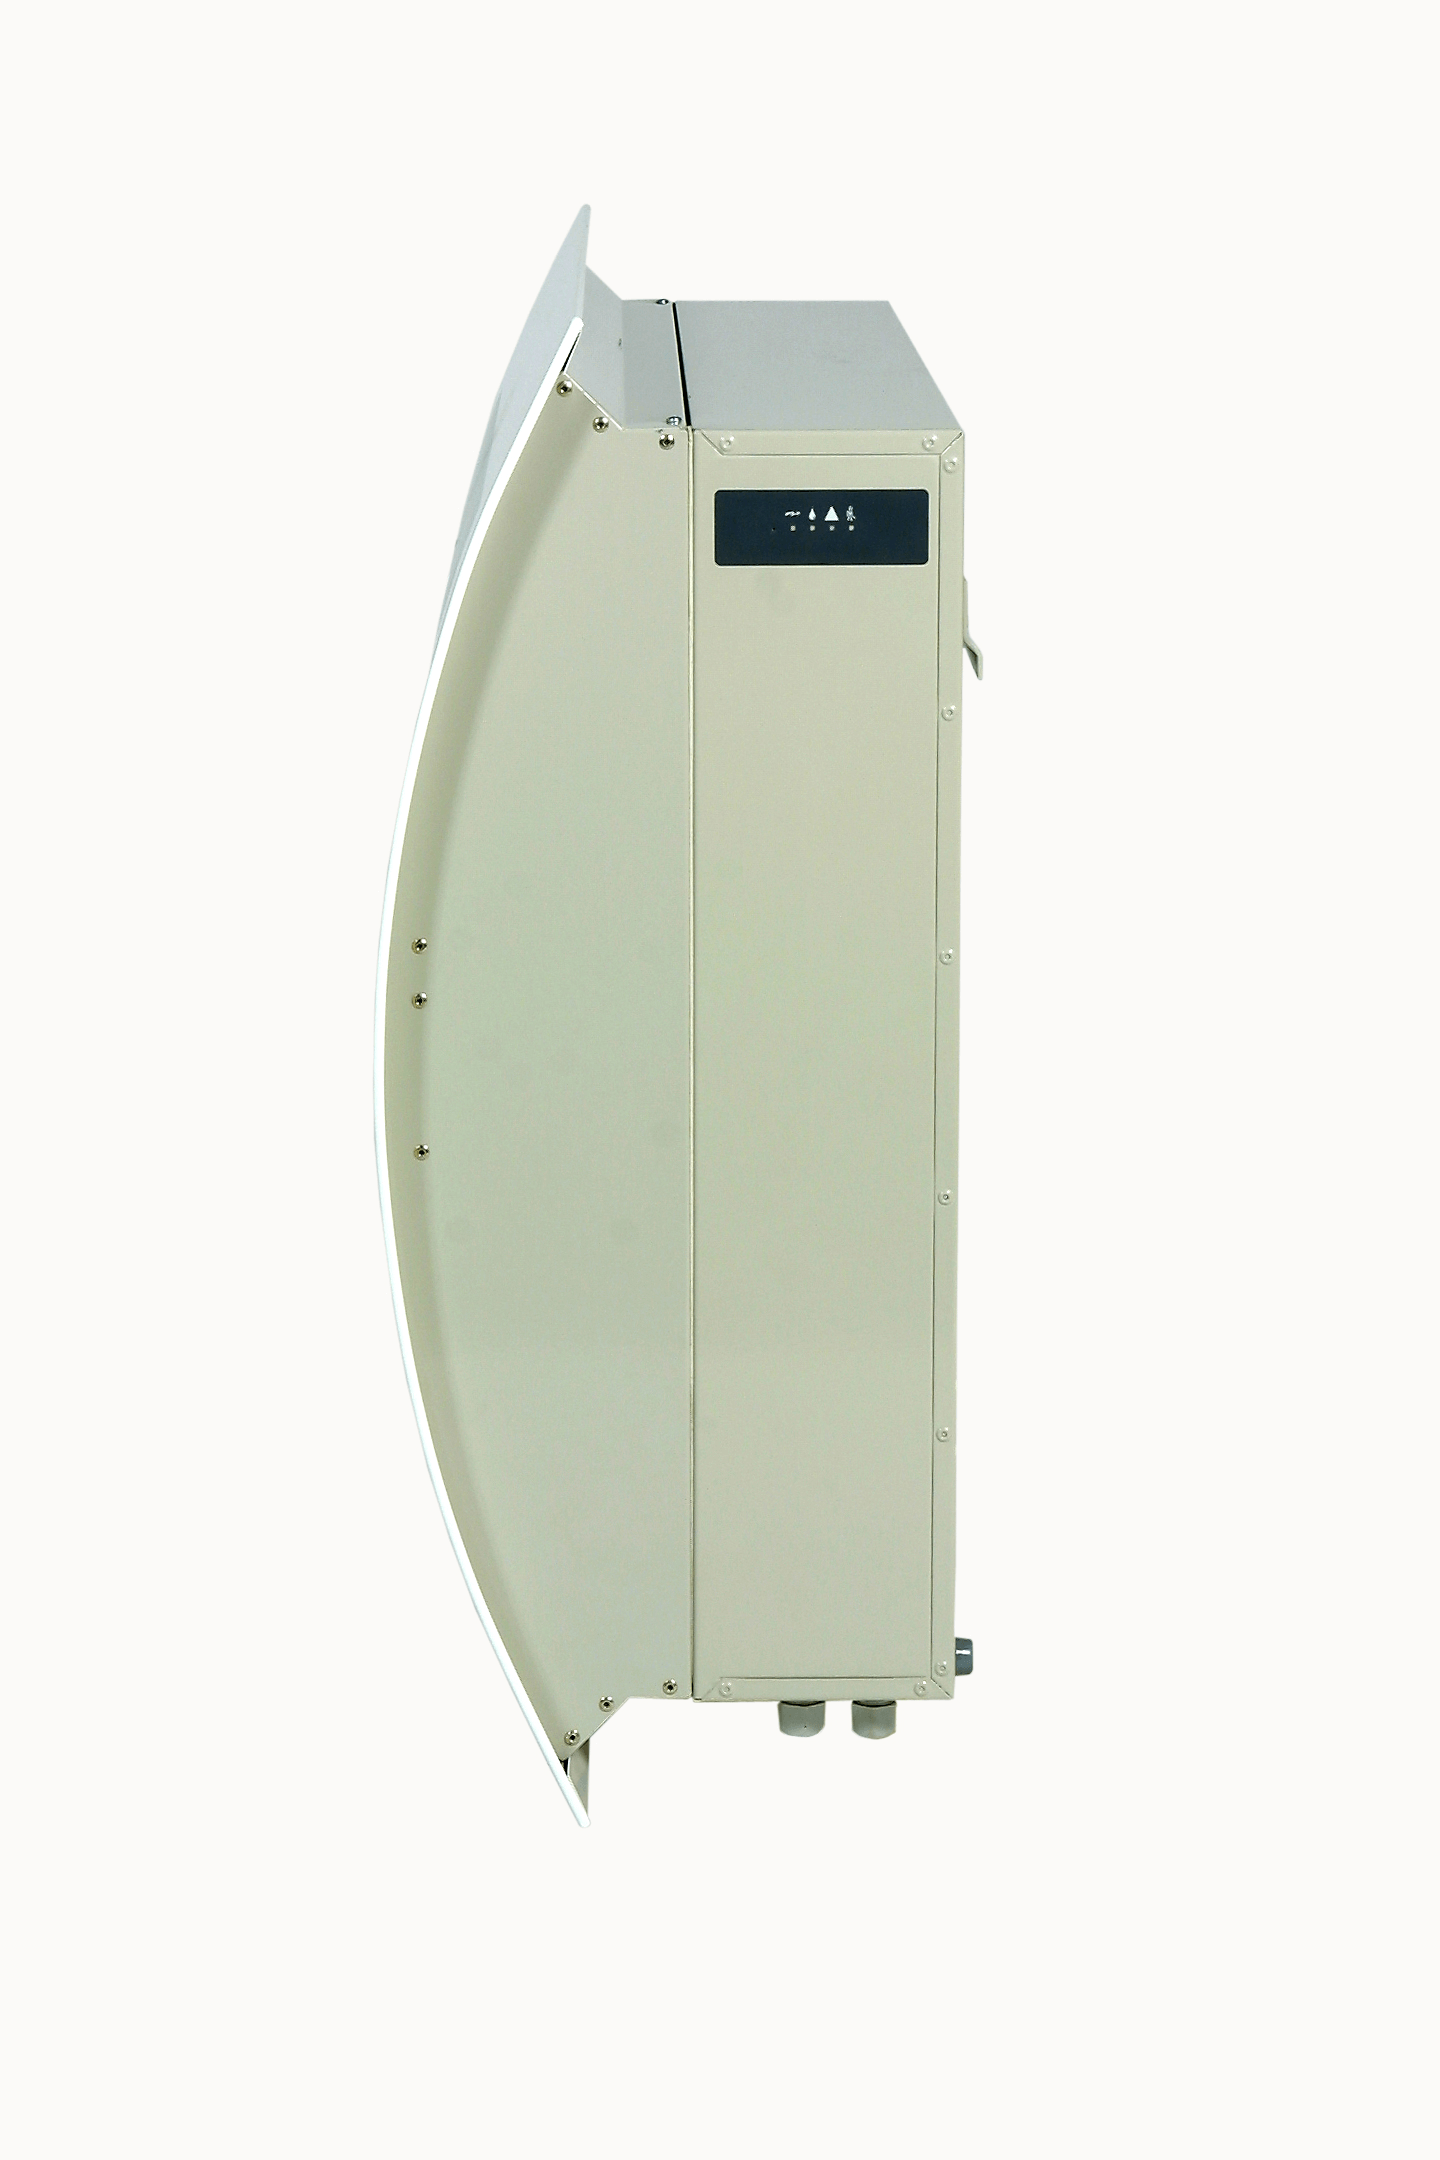 Schwimmbadentfeuchter CDP 35 Display